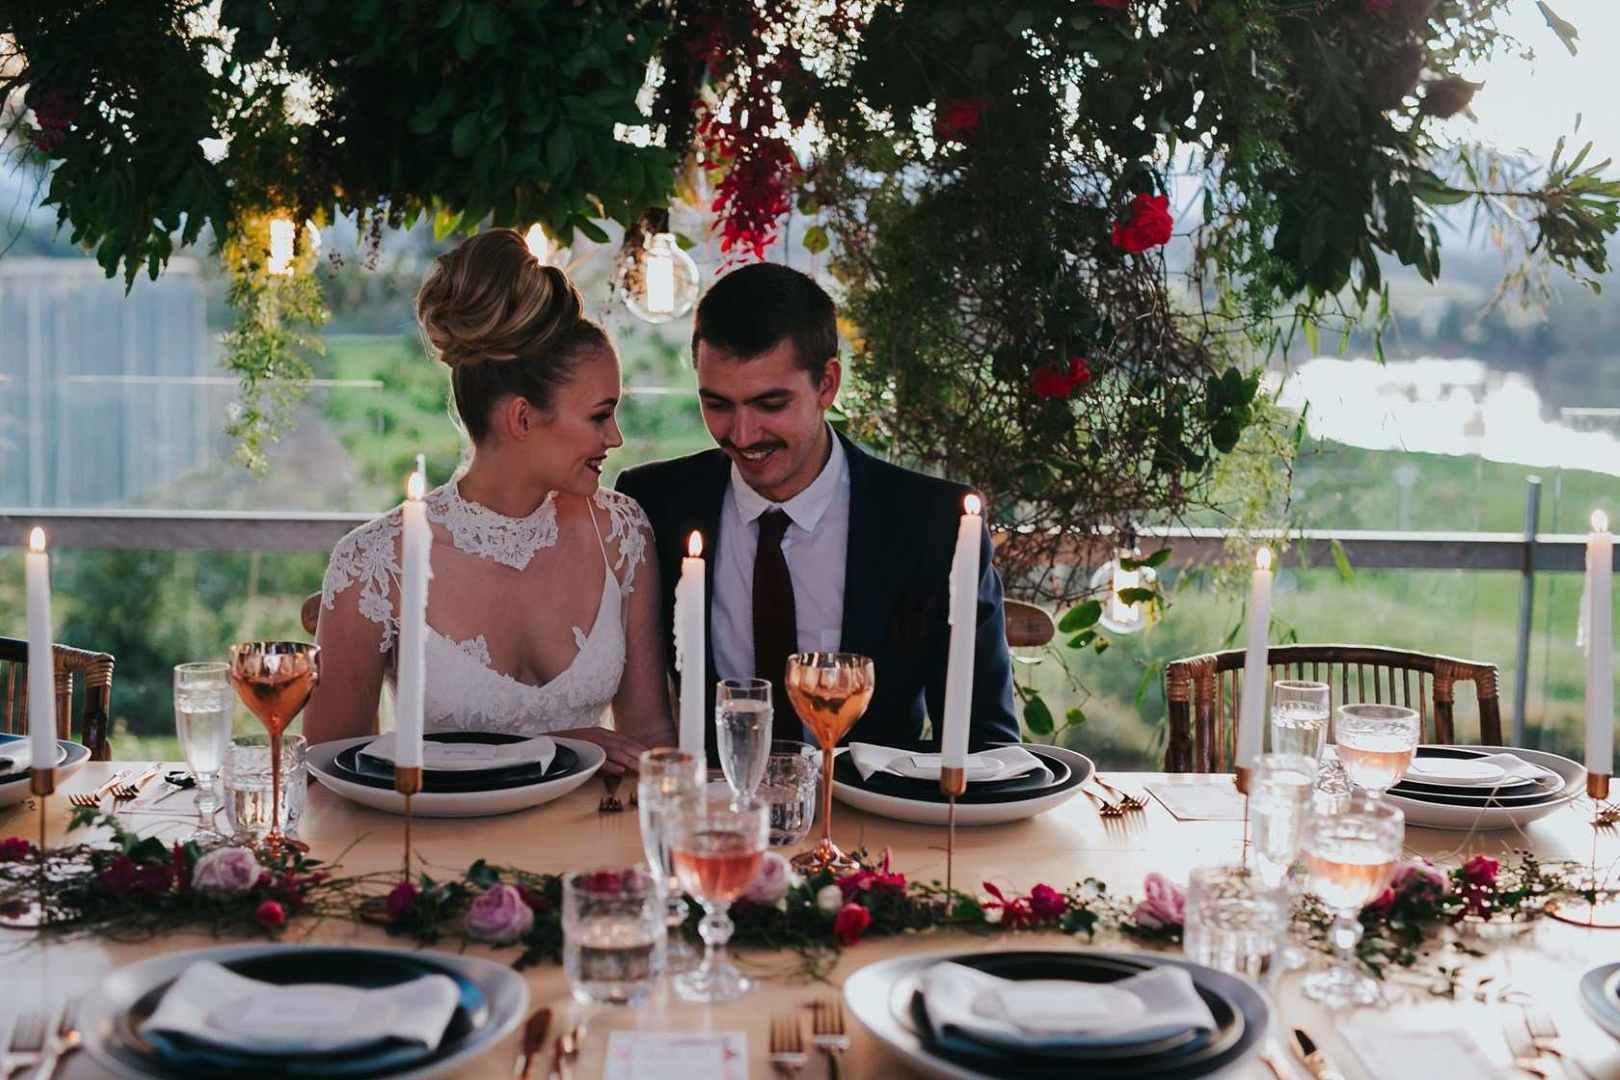 Wedding Venue - Tweed Gallery Cafe 3 on Veilability